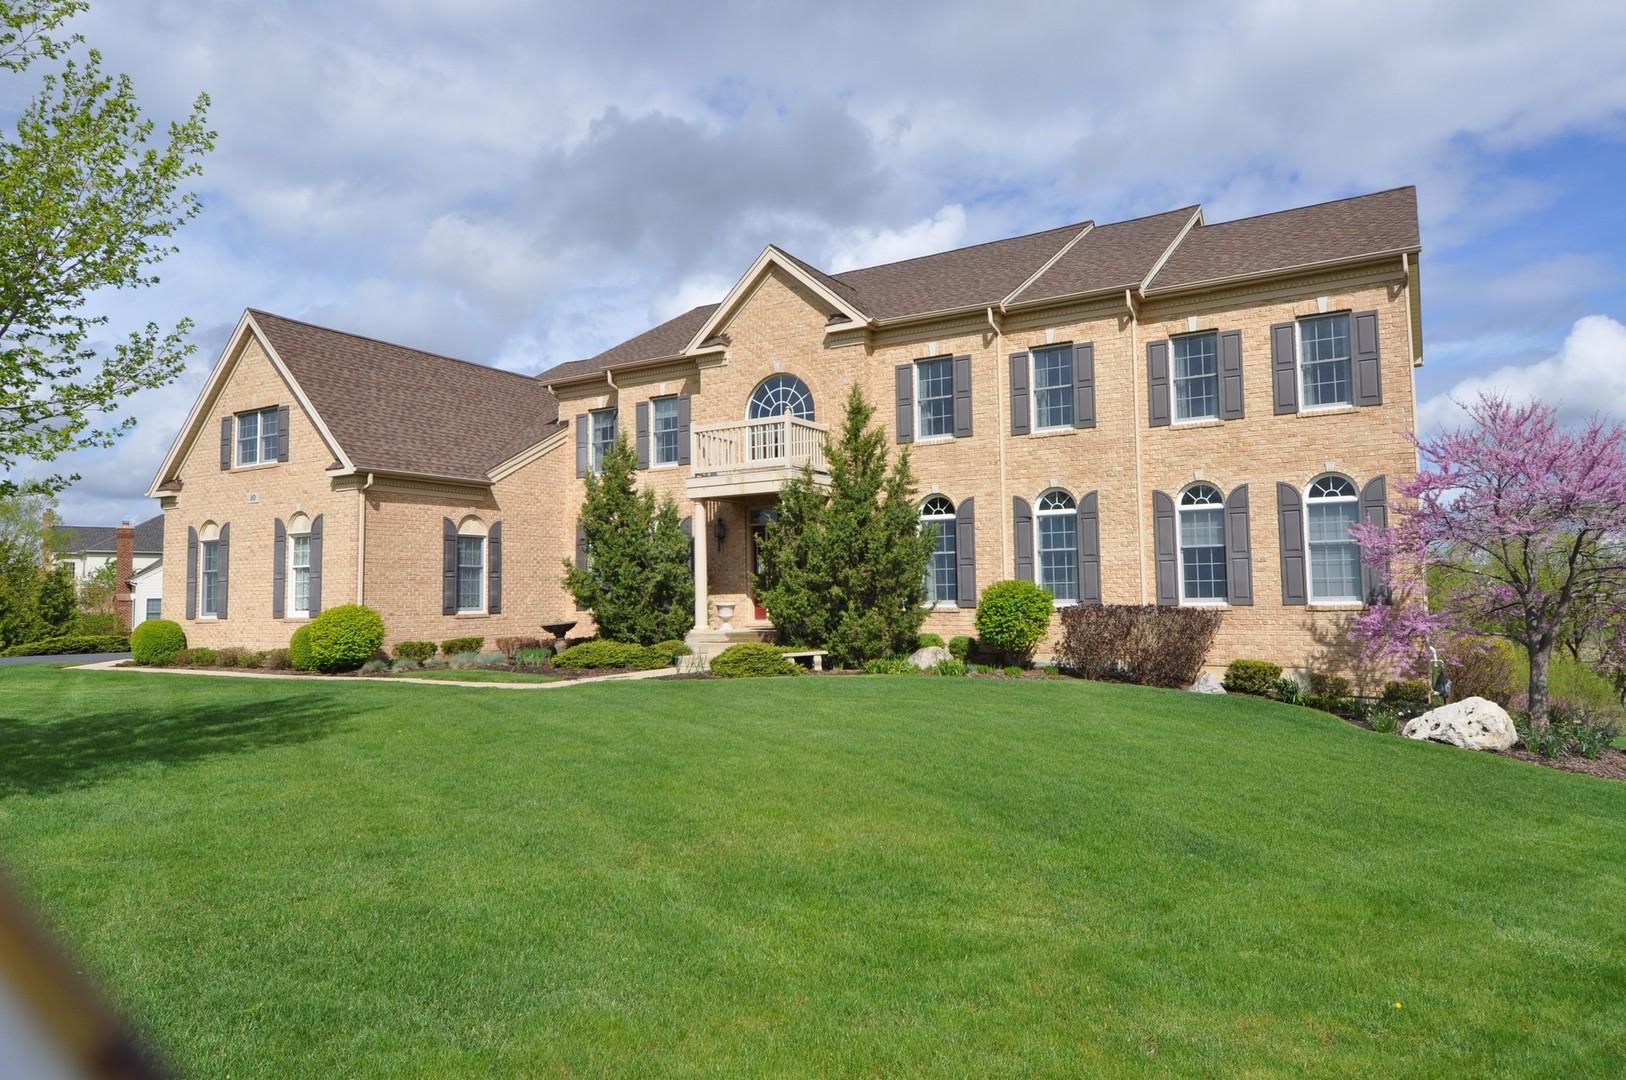 10 Whisper Creek Court, Hawthorn Woods, Illinois 60047